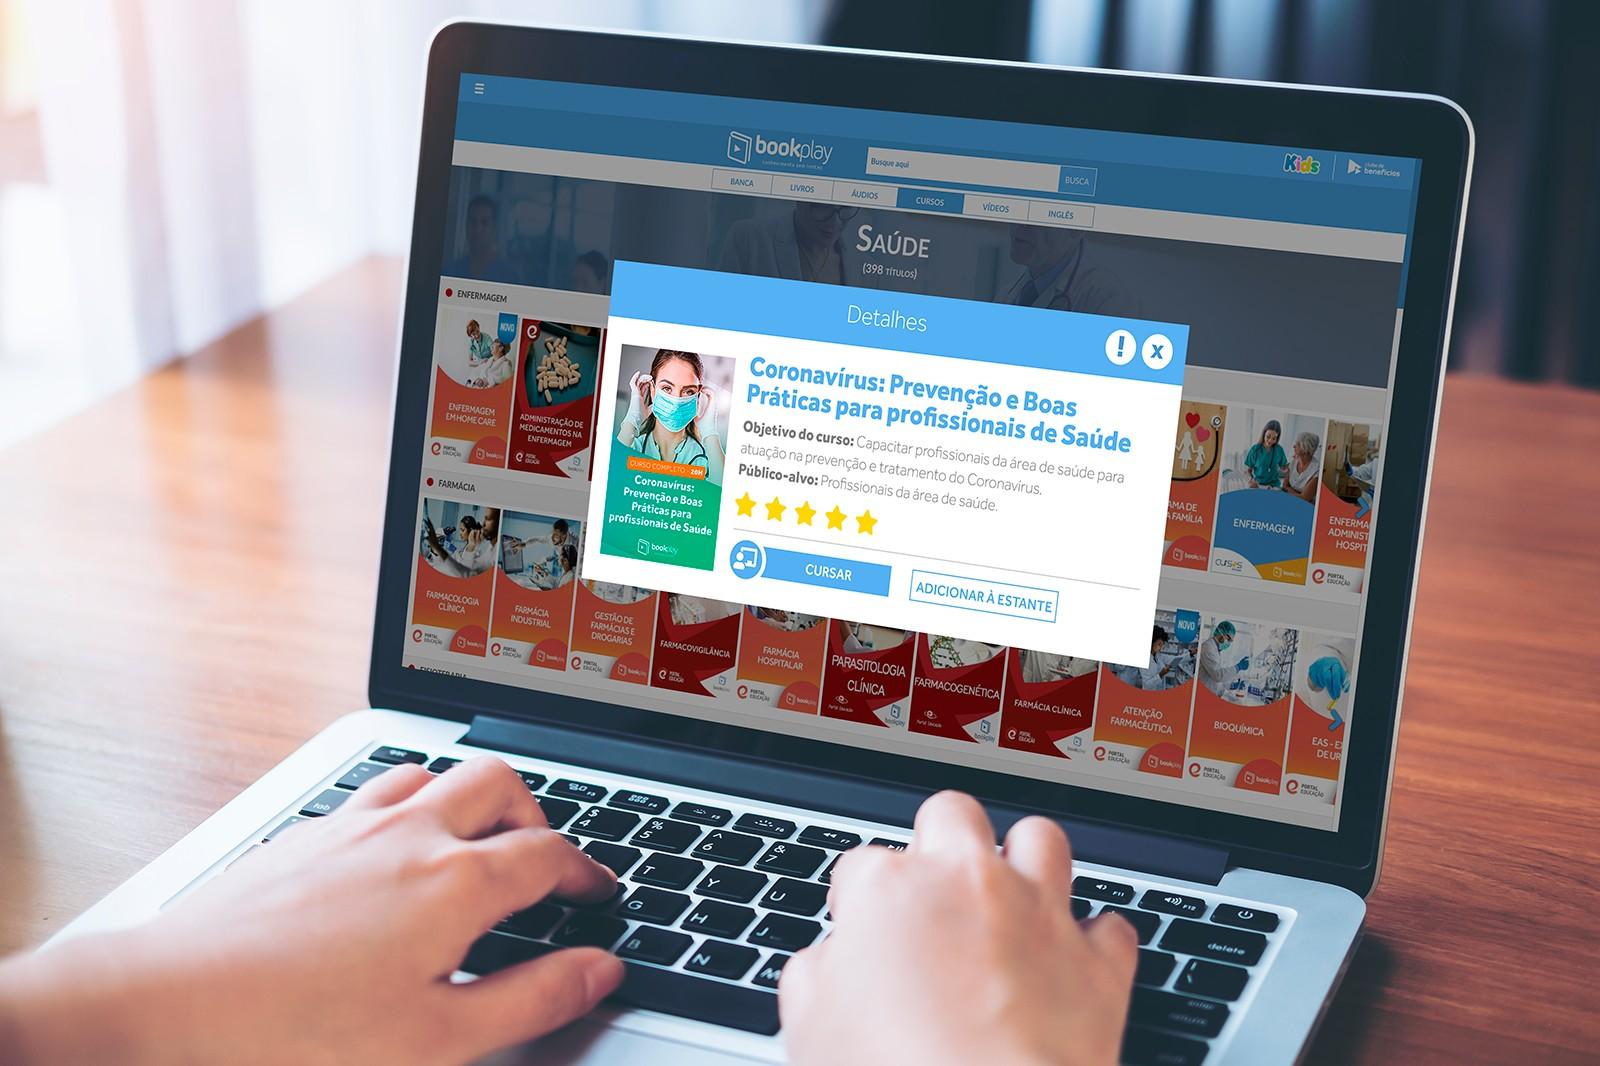 Bookplay libera curso sobre Coronavírus para os profissionais de saúde